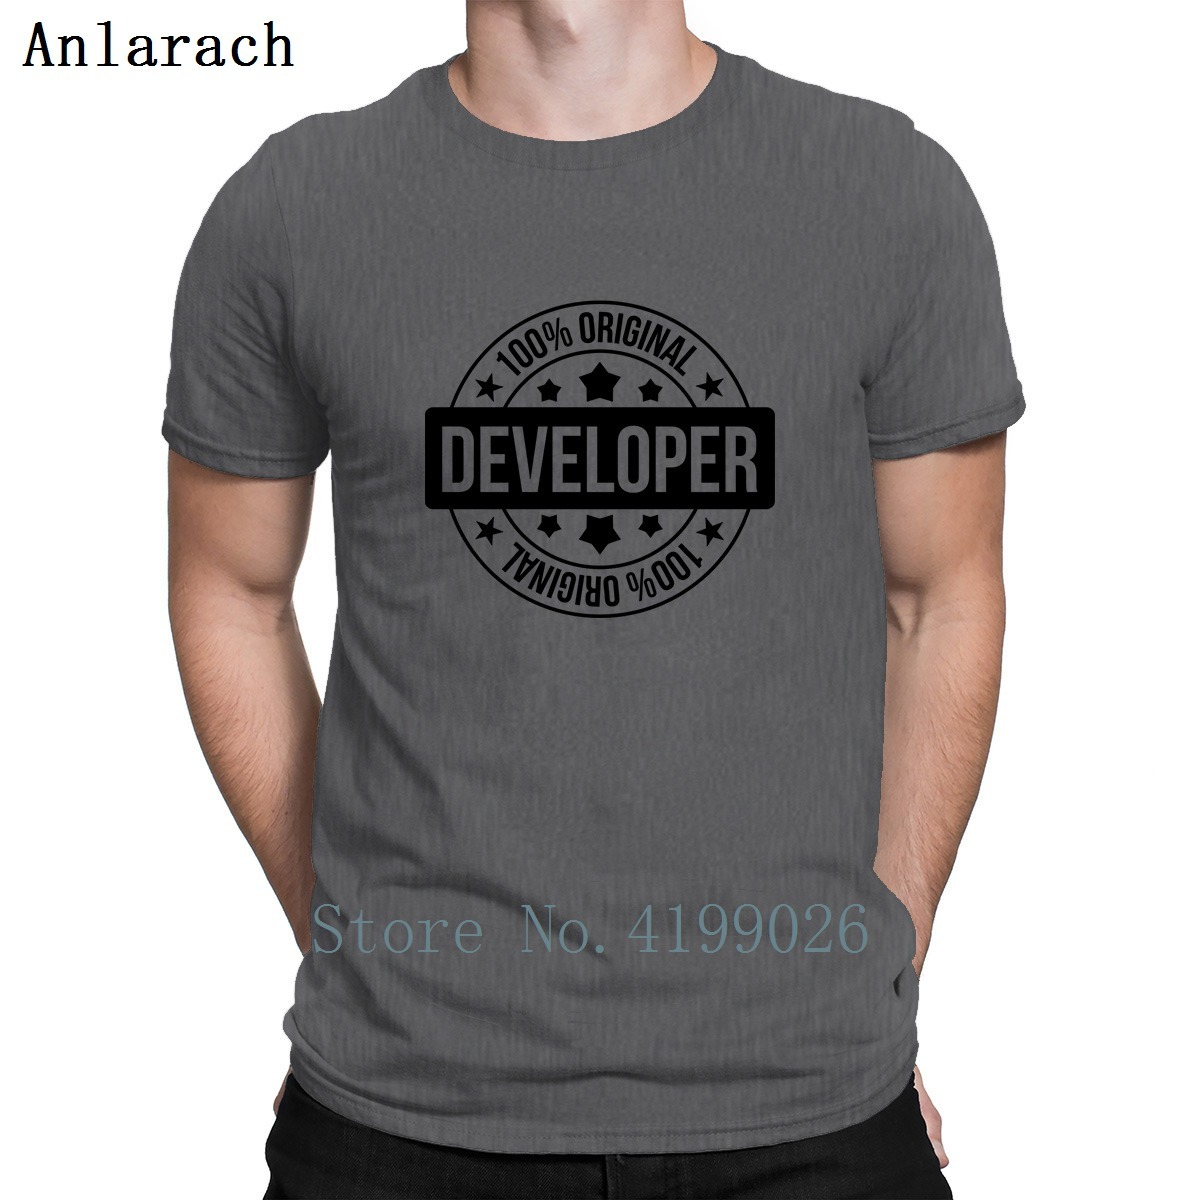 Computer Geek Engineer Informatique Developer Camisetas Hiphop Design Standard Clothing Camiseta Slim Plus Size Sunlight Authentic